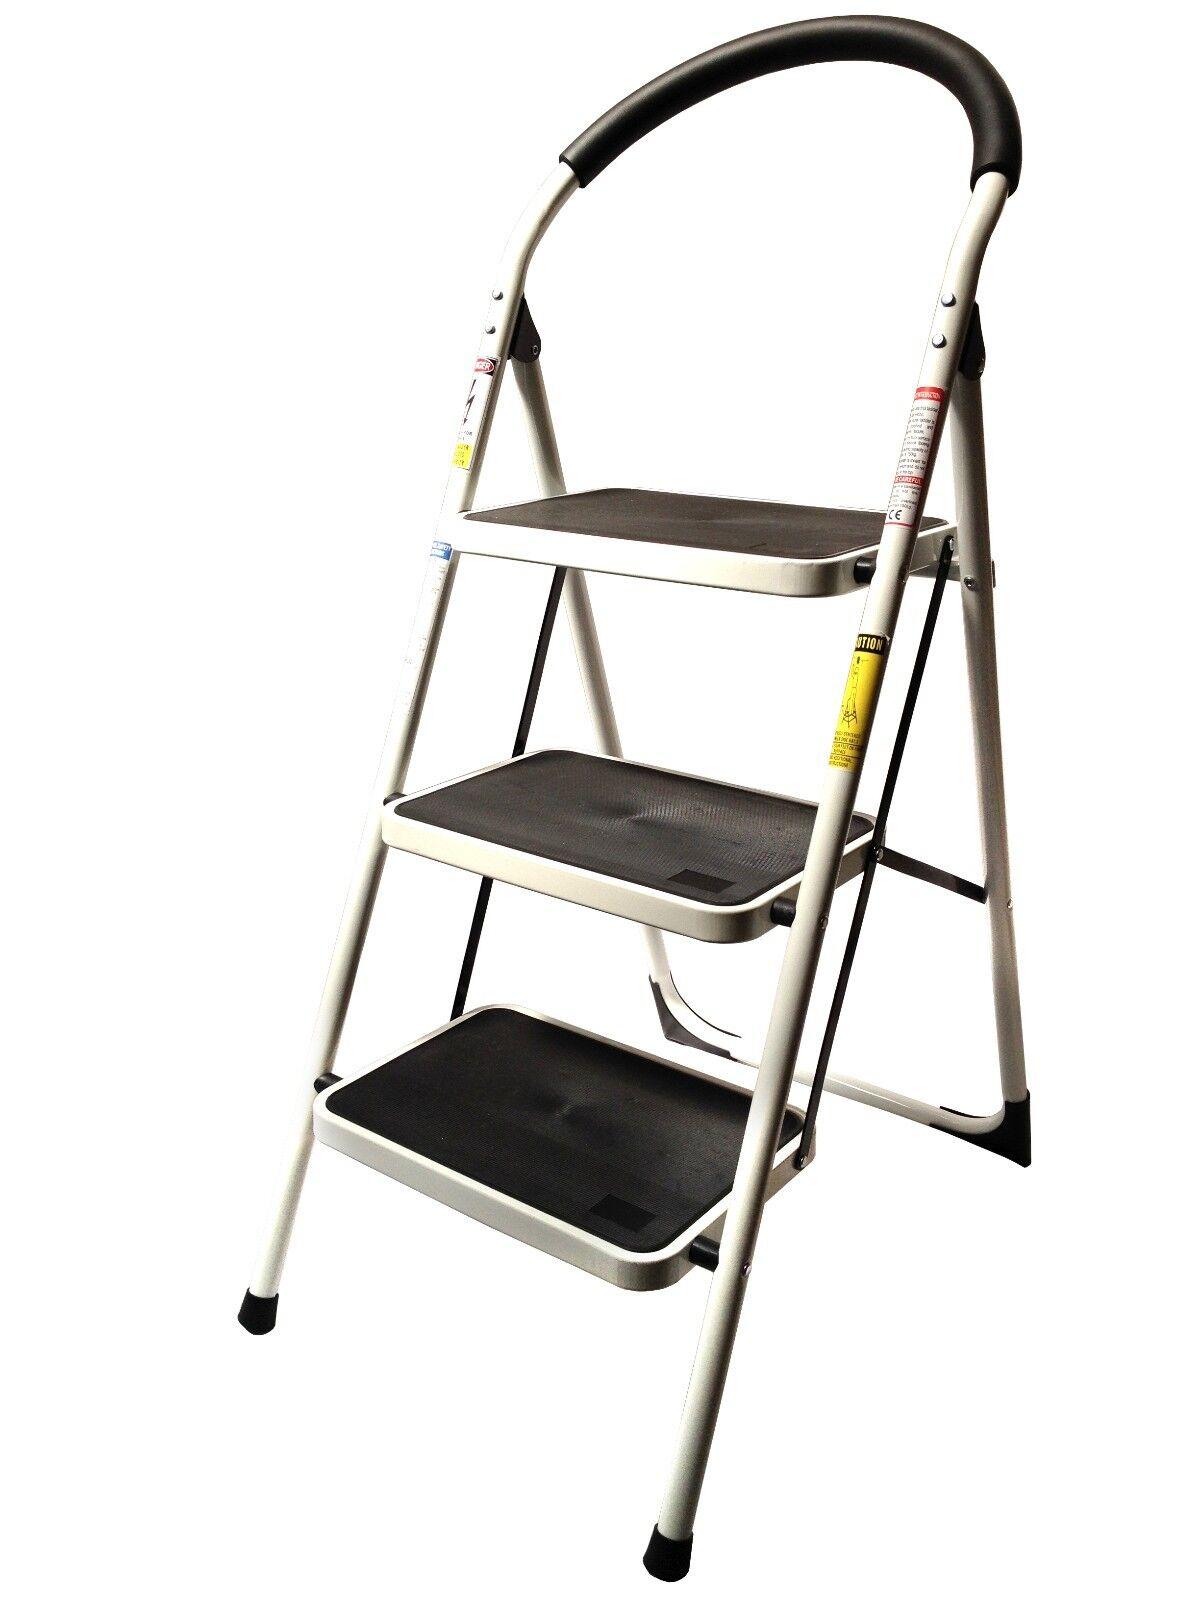 3 Step Ladder Lightweight Folding Stool Heavy Duty